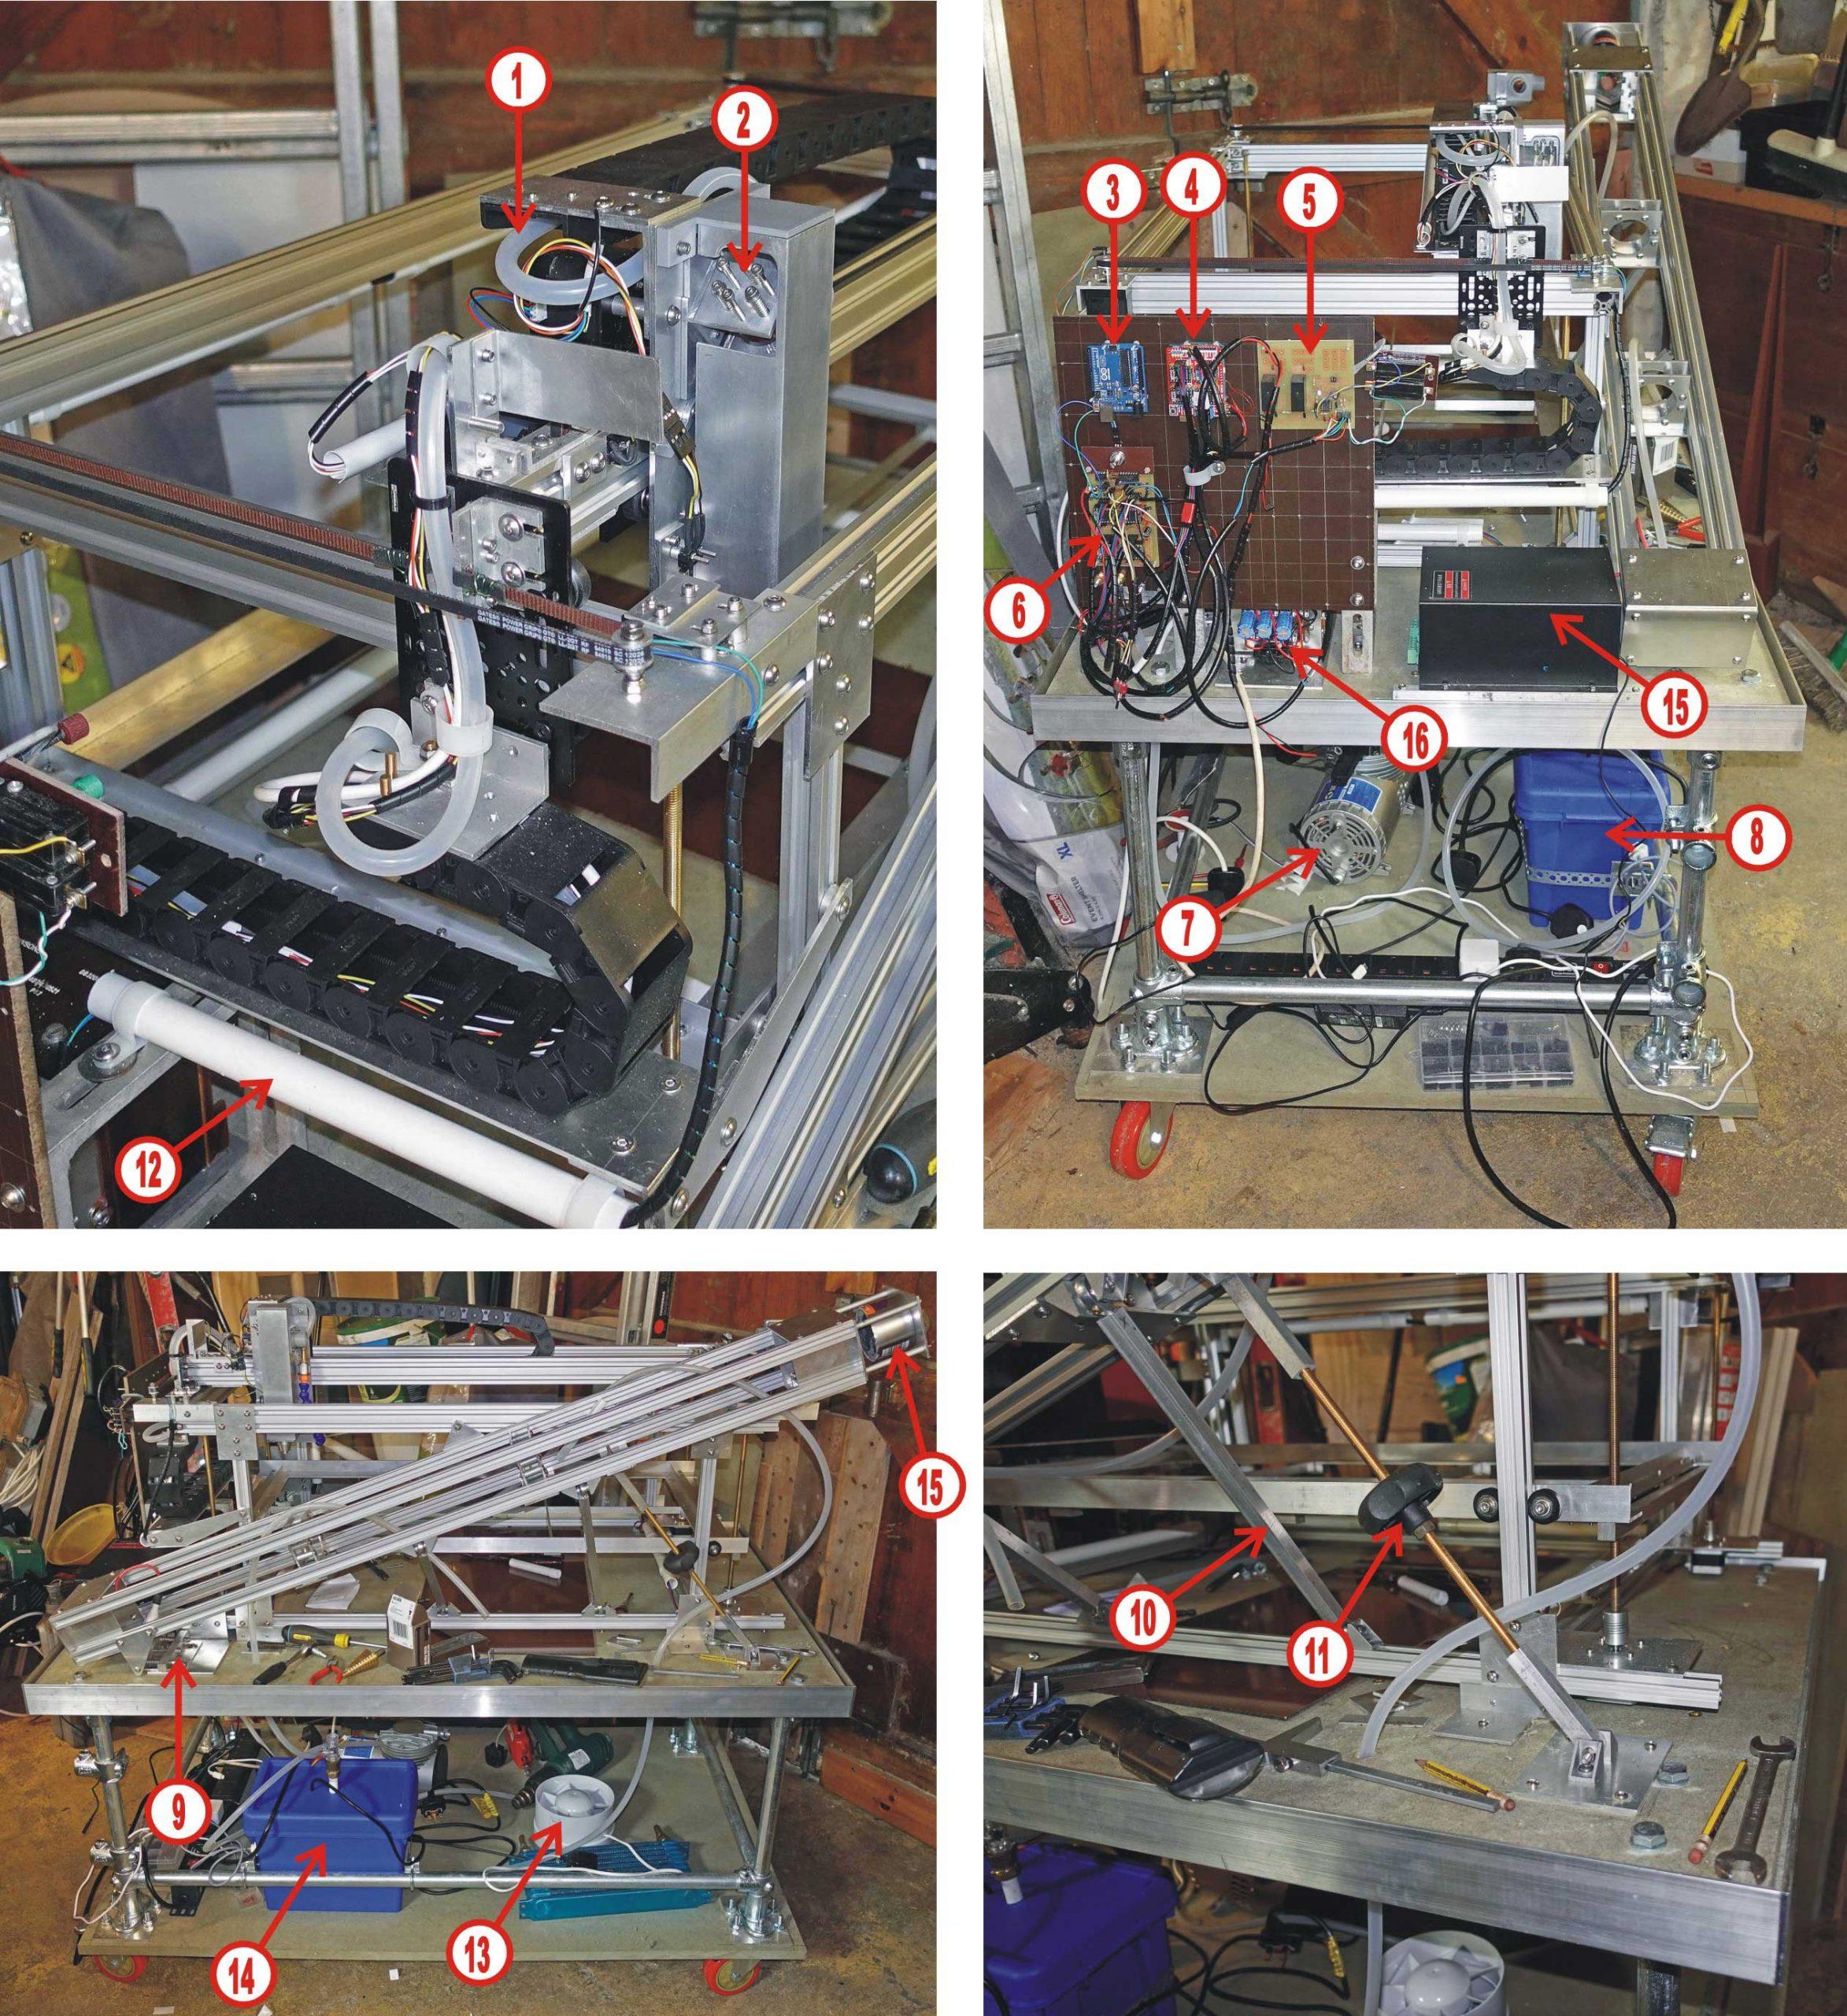 Laser cutter, progress on construction